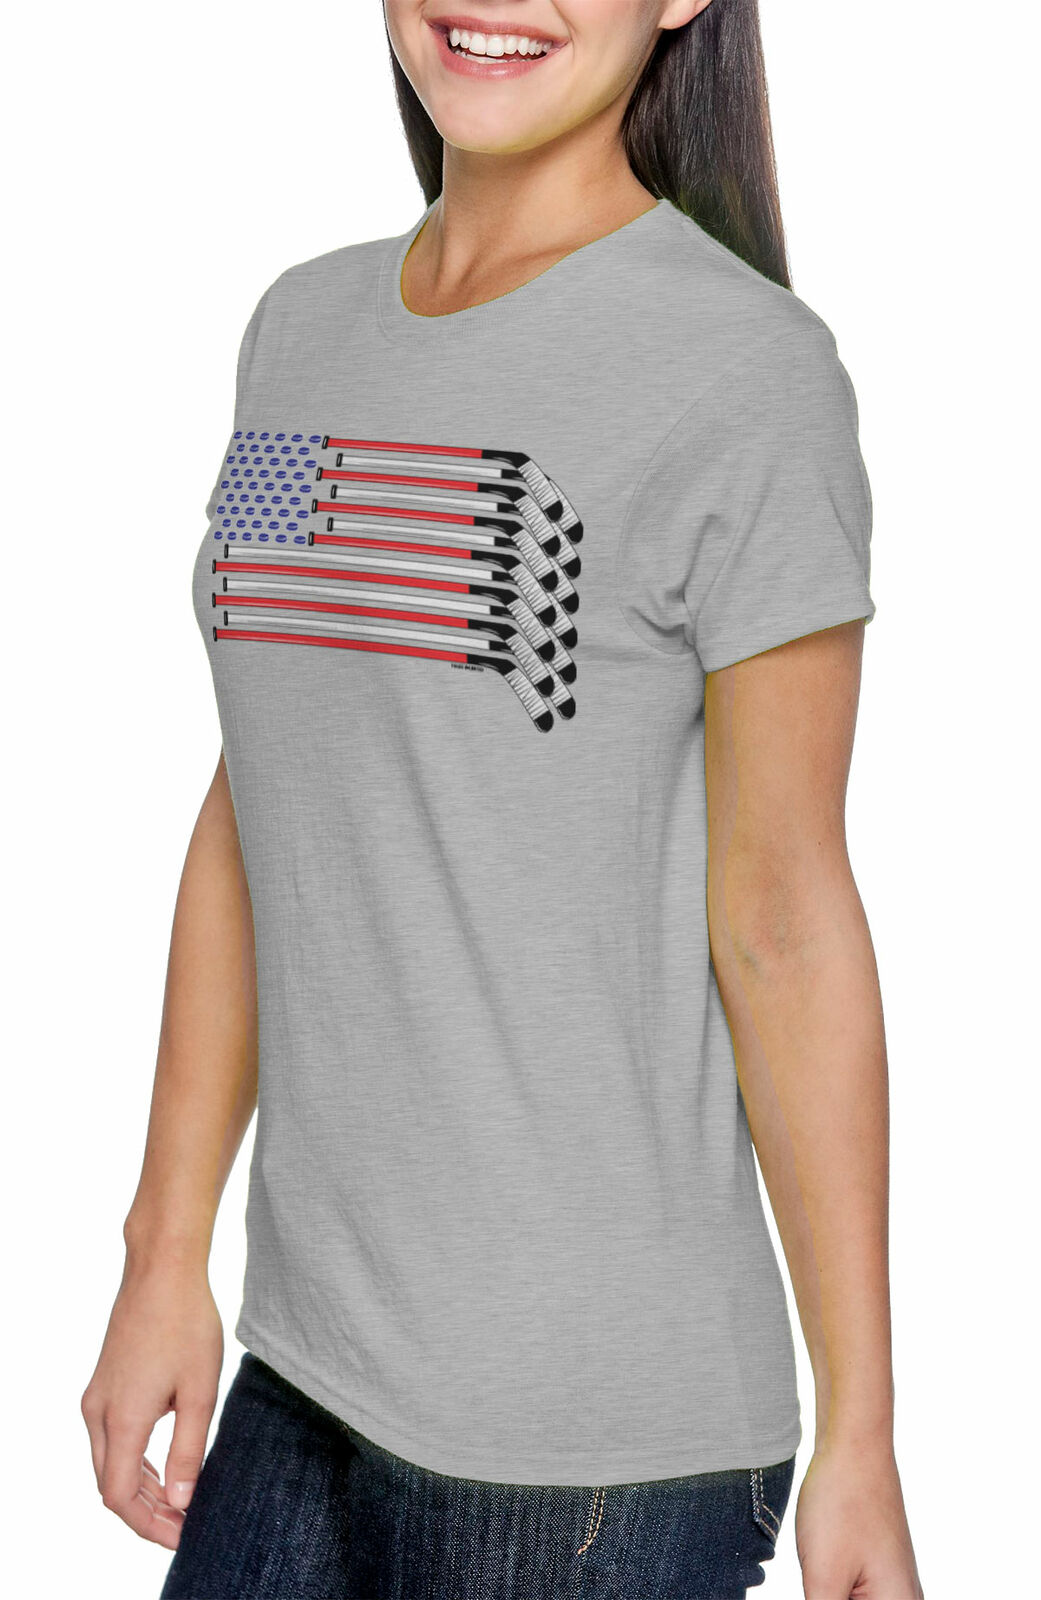 Hockey Stick in American Flag Women T-Shirt Mountaineering Shirts